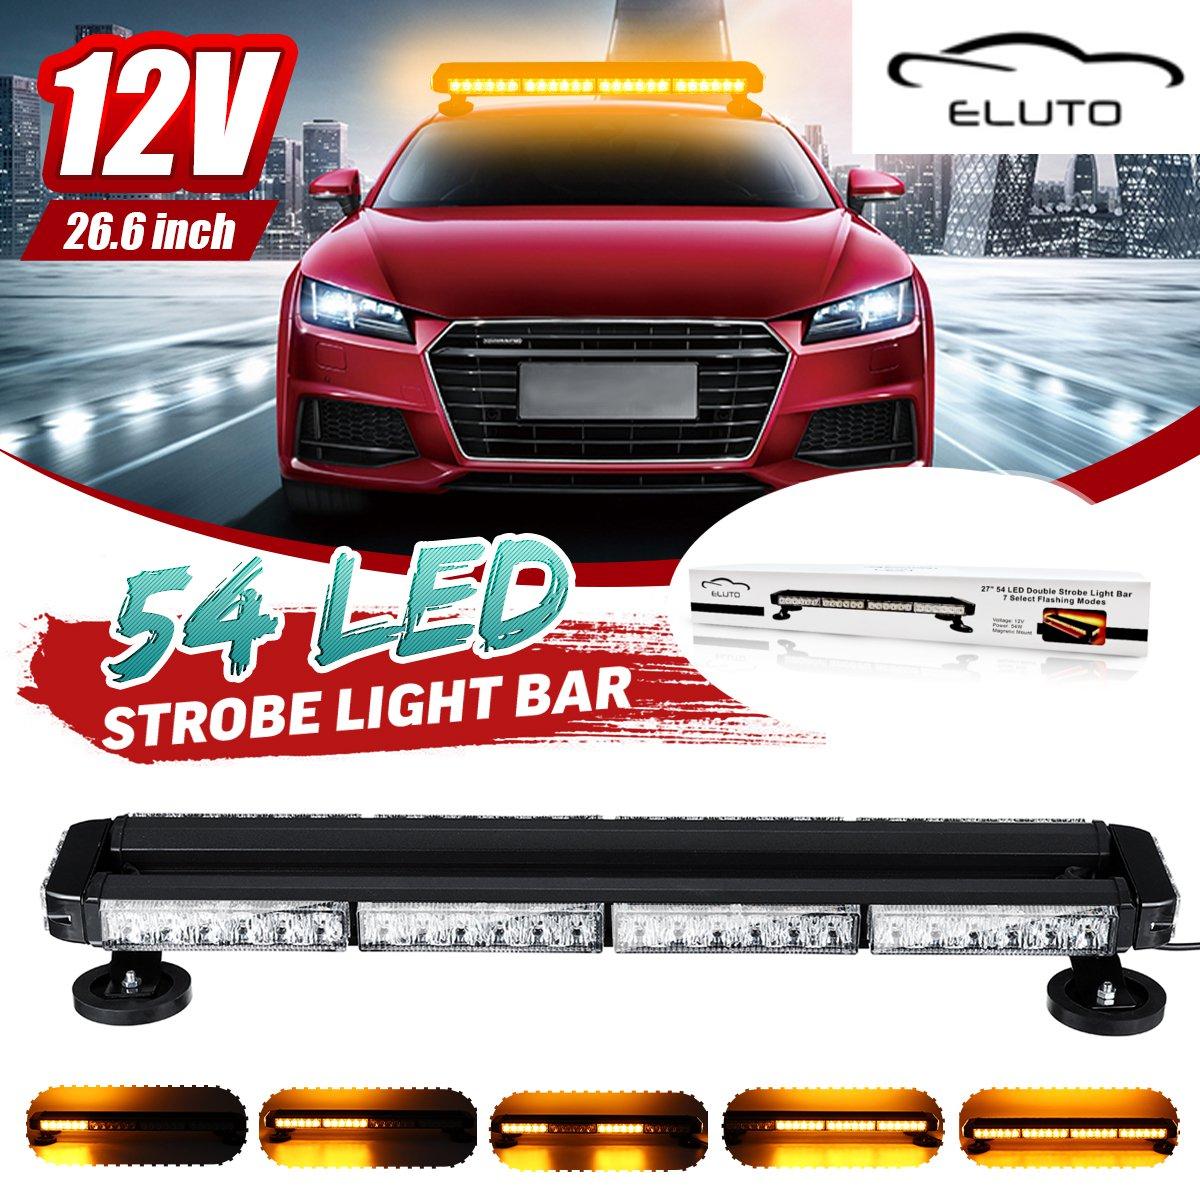 54 LED 4 Side Car Roof Advisor Beacon Strobe Flashing Security Warning Light Bar Emergency Light Magnetic 7 Flash Patterns